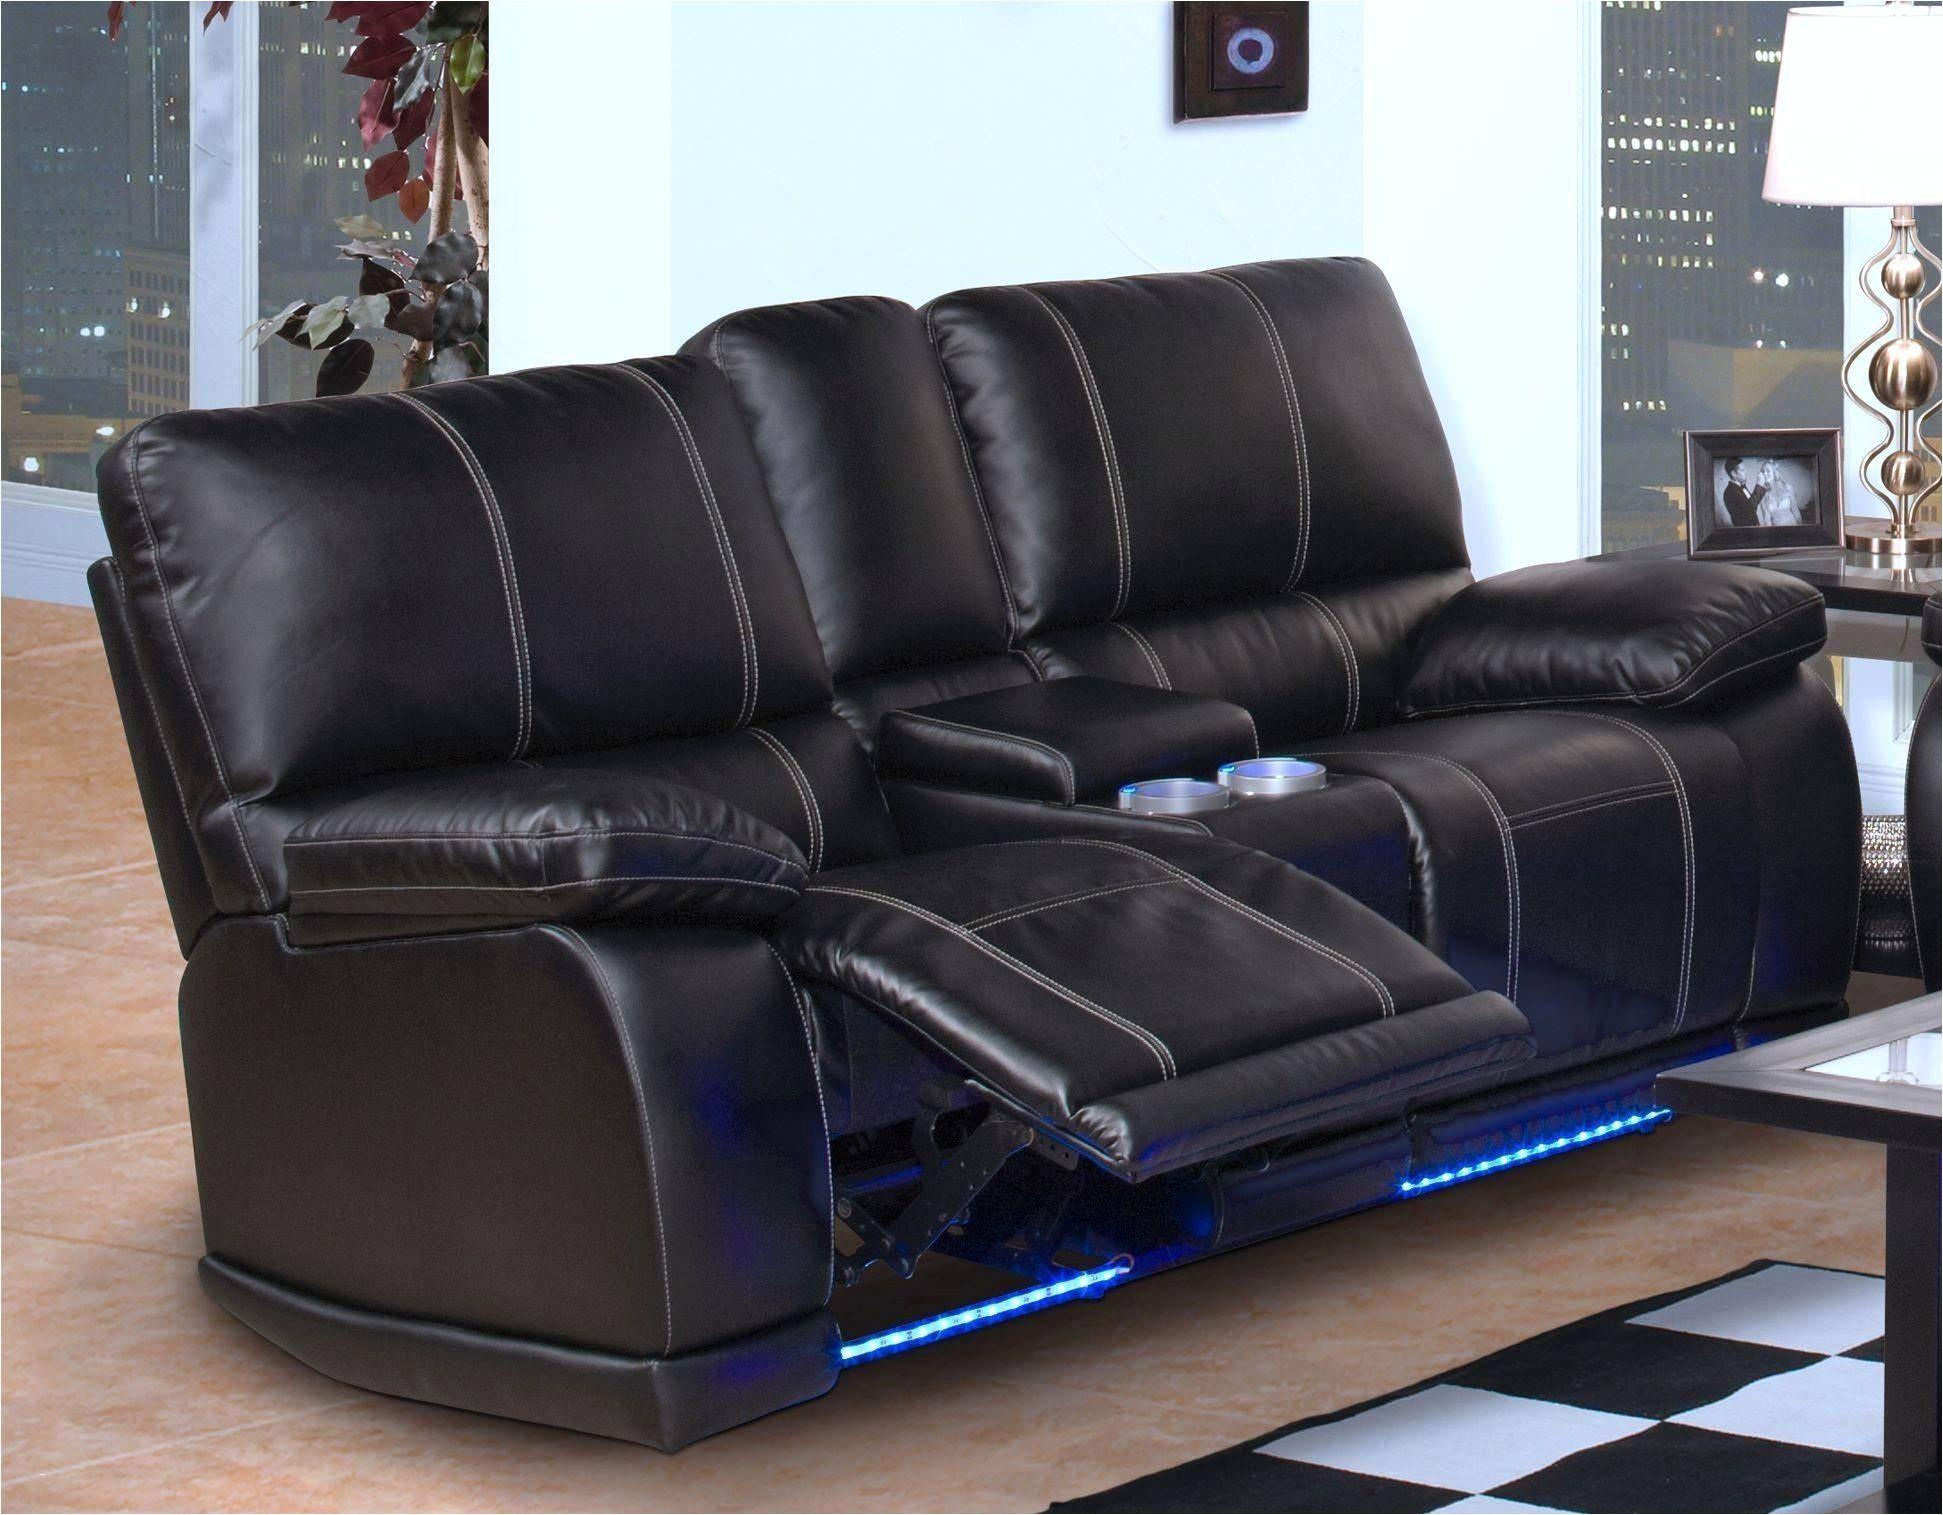 kids recliner big lots luxury furniture gray reclining loveseat best tufted loveseat 0d top ergebnis 50